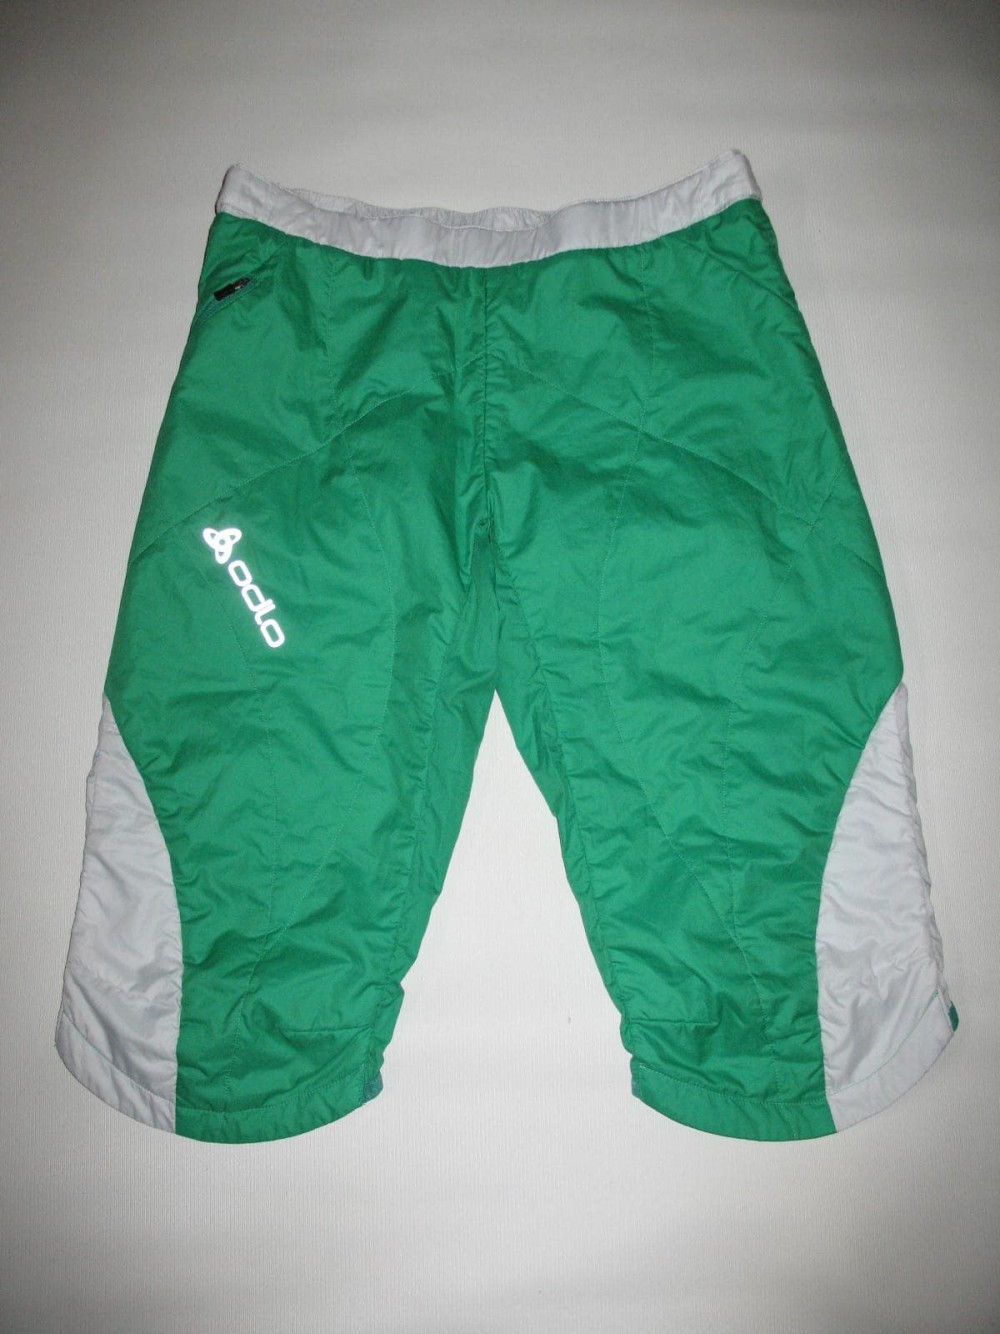 Шорты ODLO primaloft shorts lady (размер S/M) - 2